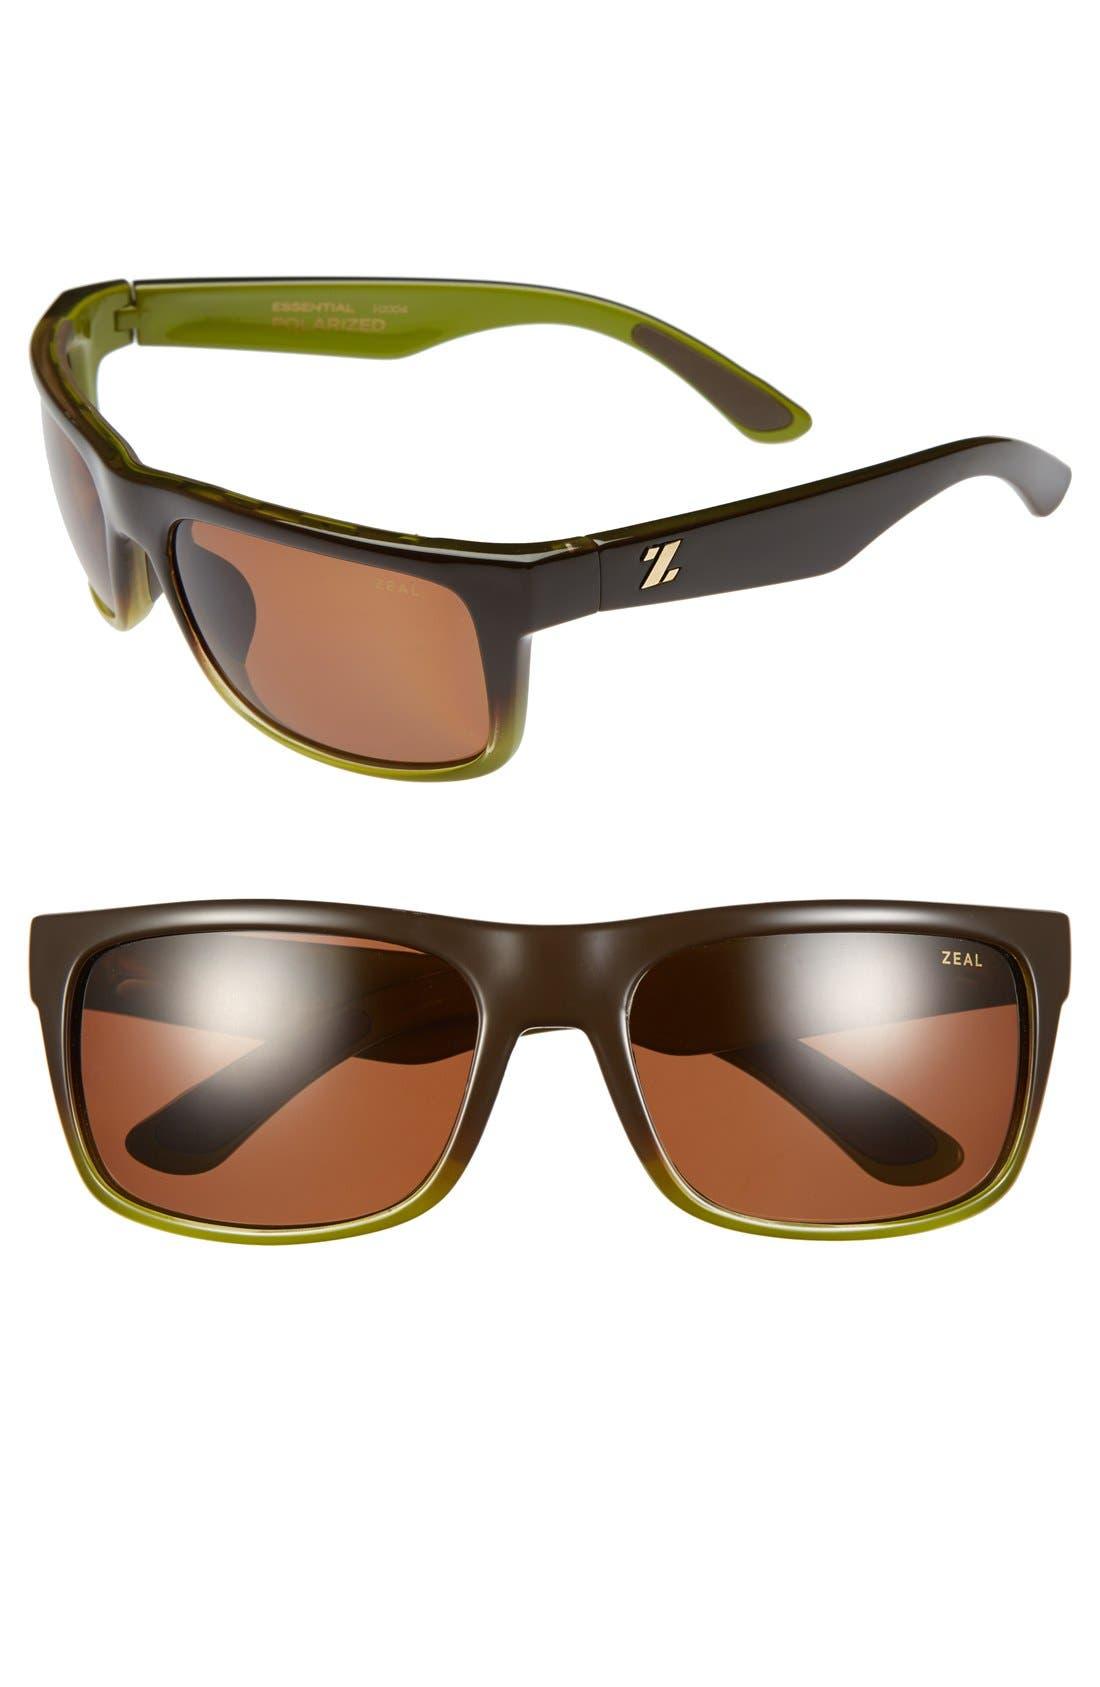 Main Image - Zeal Optics 'Essential' 58mm Polarized Plant Based Sunglasses